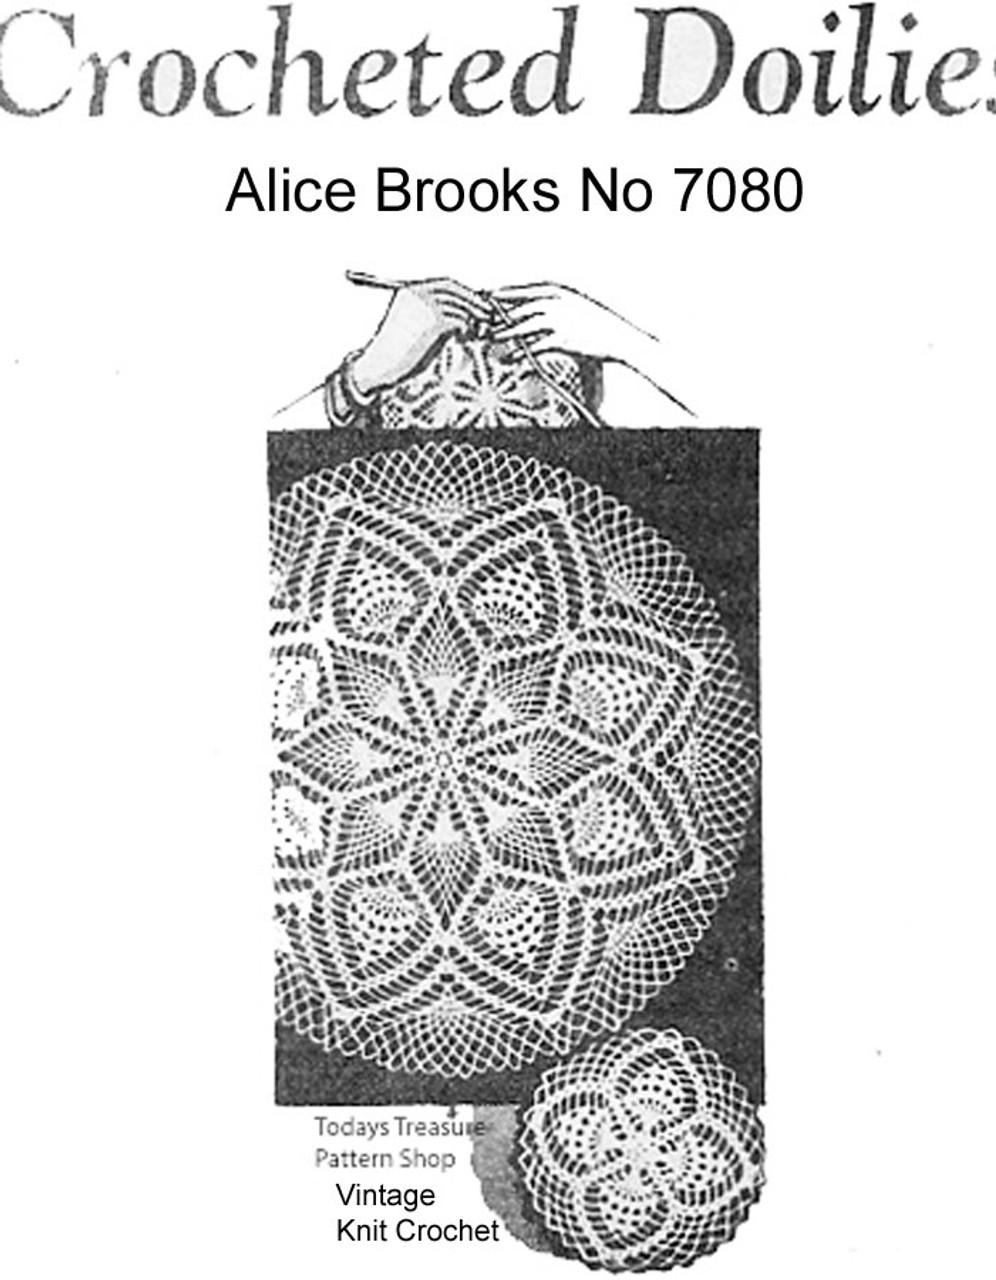 Alice Brooks Crochet Pineapple Doily pattern No 7080